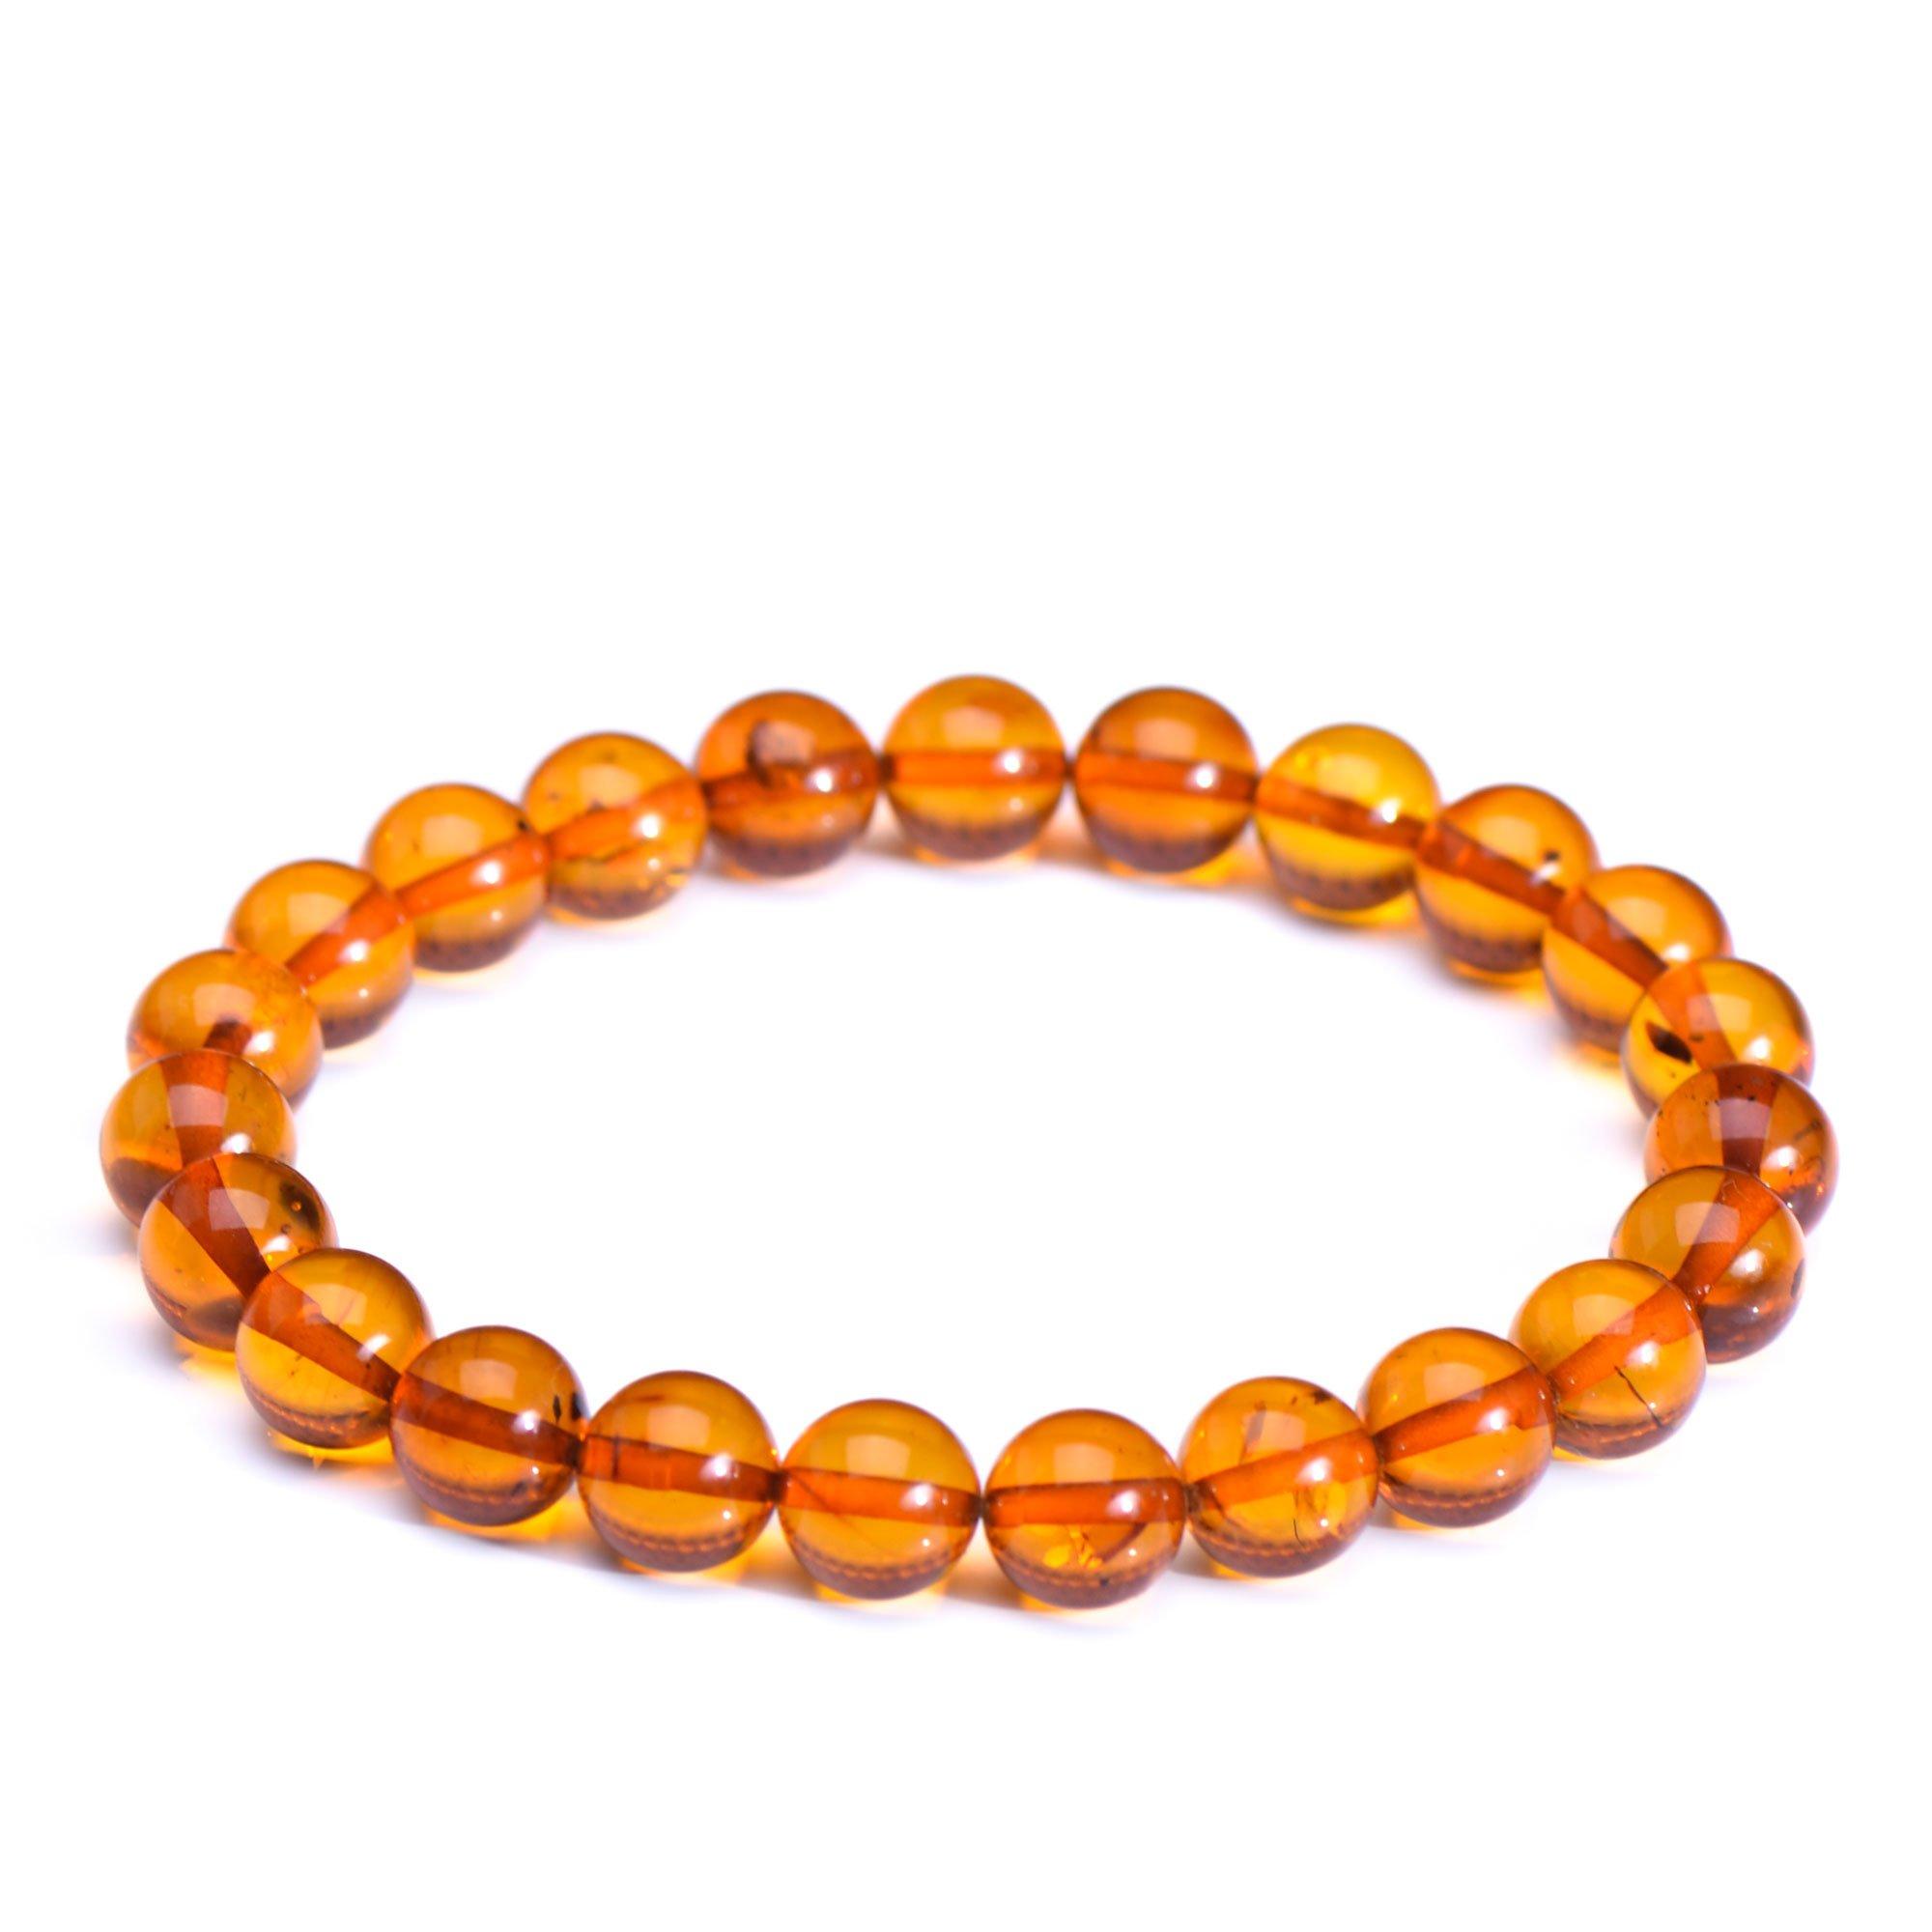 Round Beads Amber Bracelet - Unisex Amber Bracelet - Elastic Amber Bracelet - Certified Baltic Amber Handmade Round Bead Bracelet by Genuine Amber